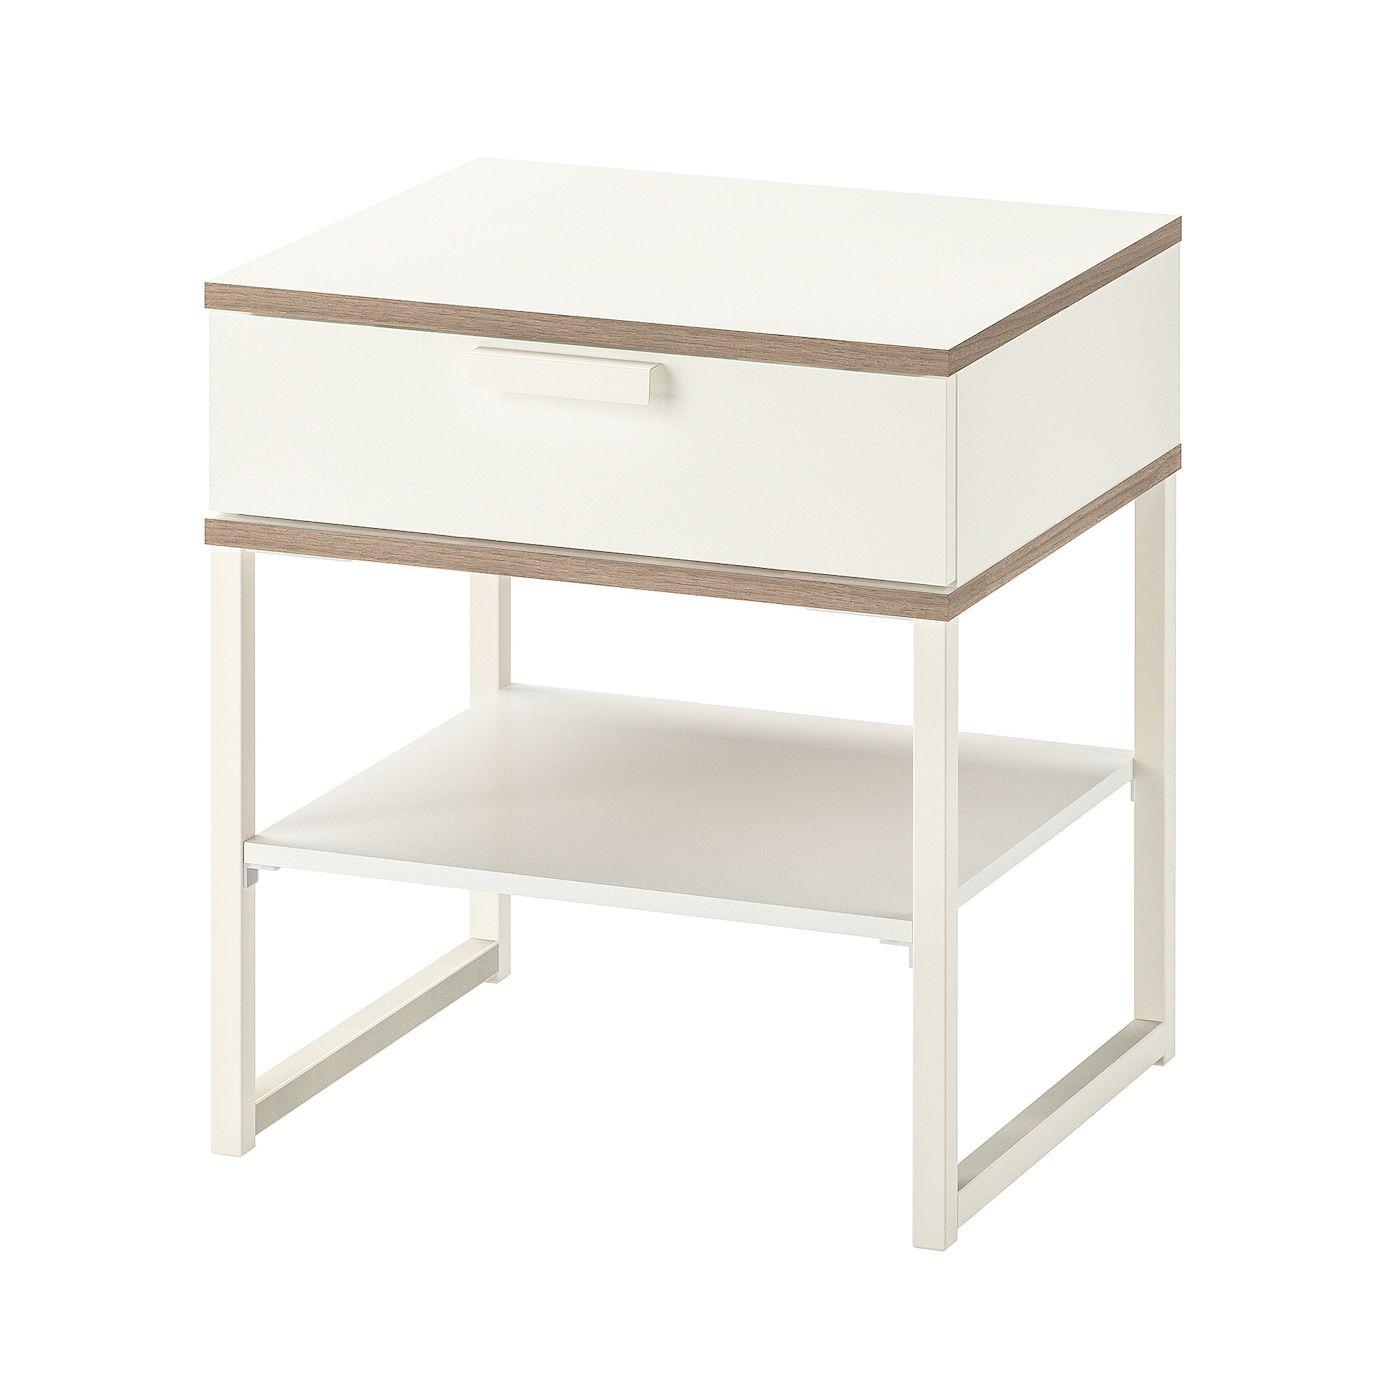 Trysil Table Chevet Blanc Gris Clair 45x40 Cm Mit Bildern